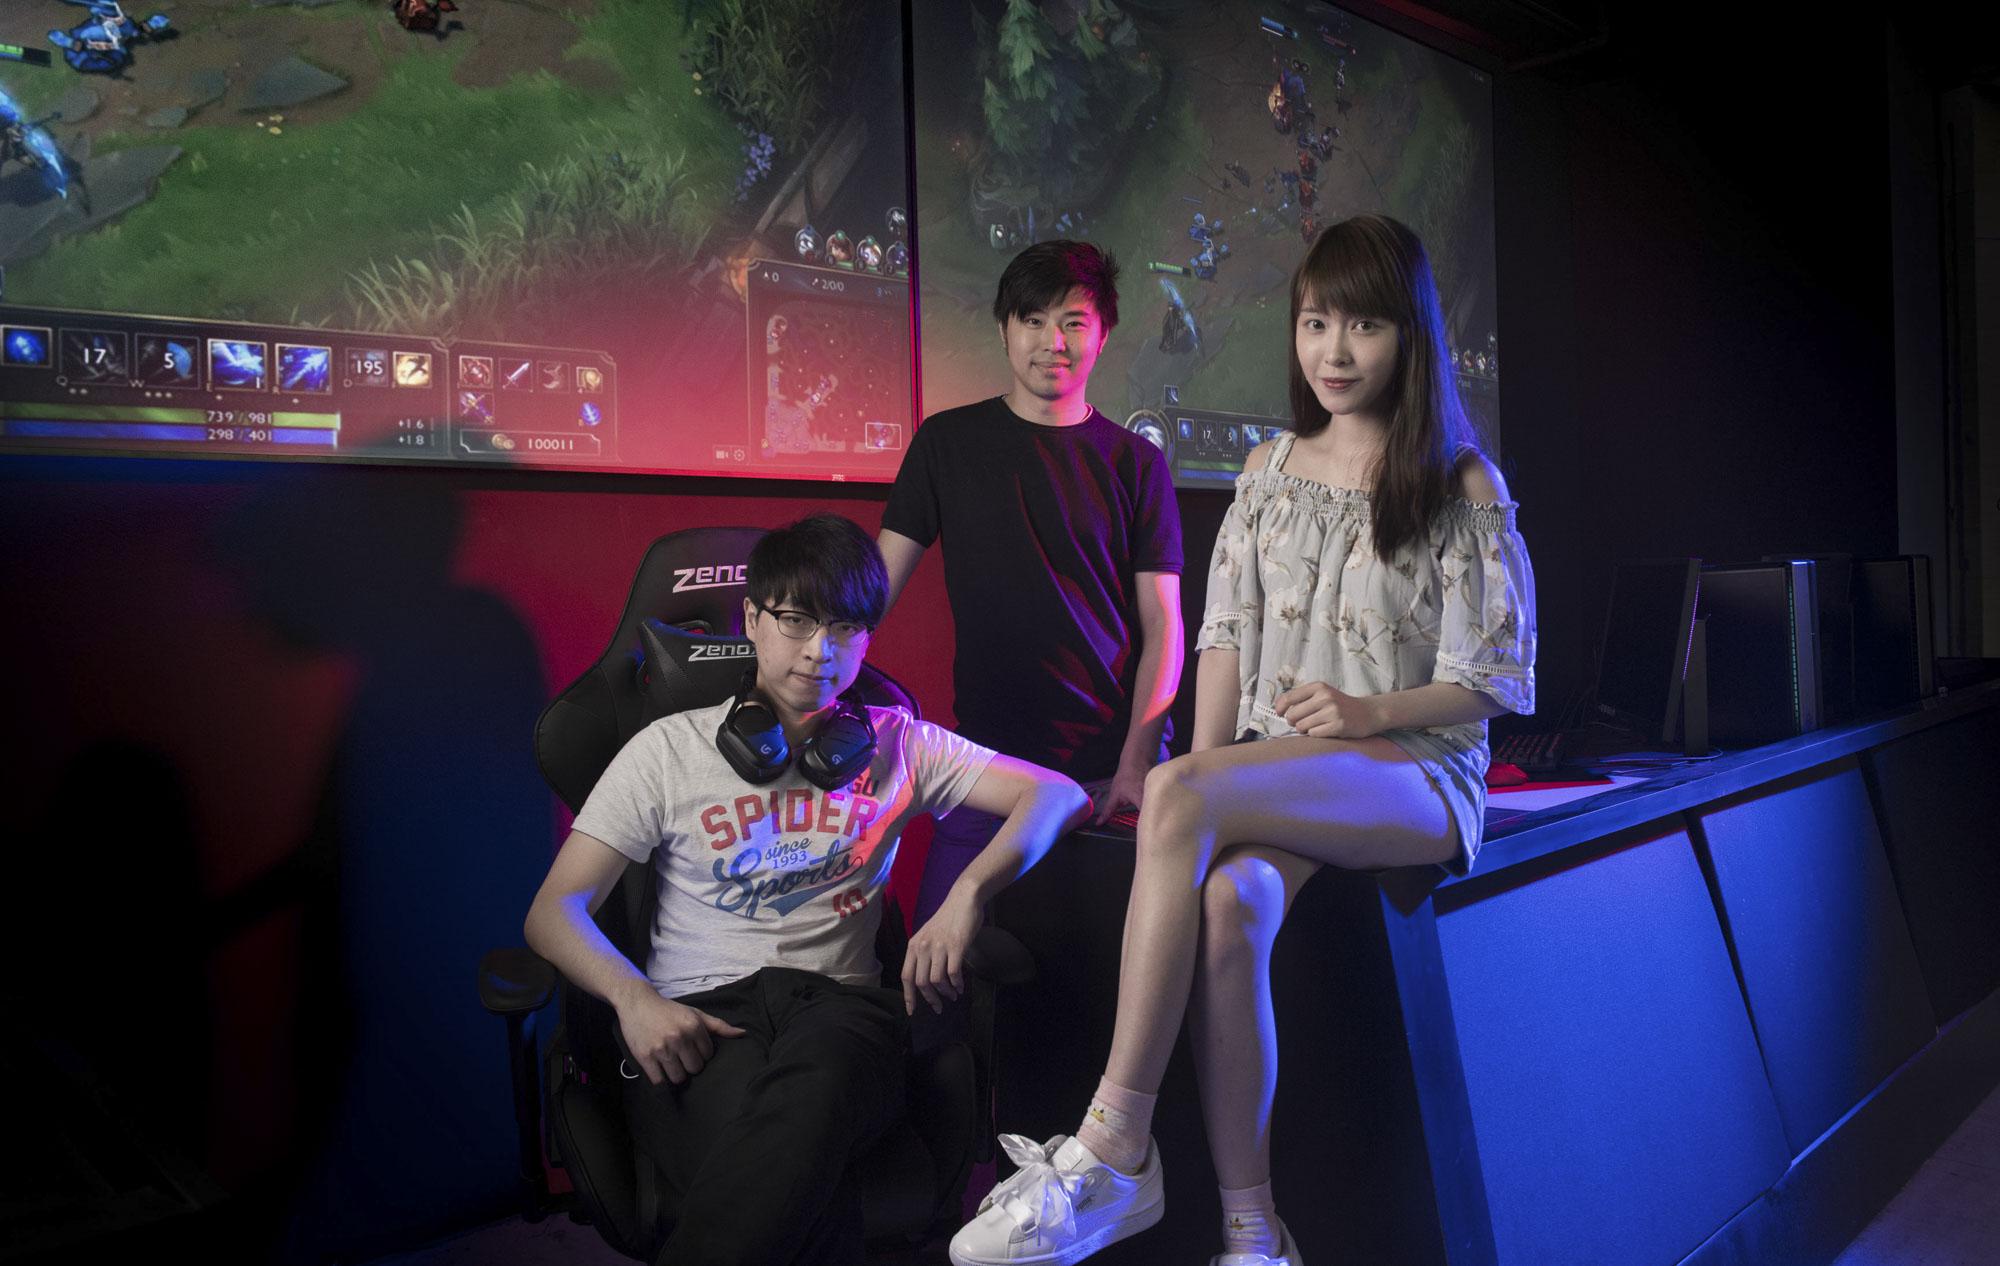 Hong Kong e-Sports gamers LOFS, Ryan Chow and Deer